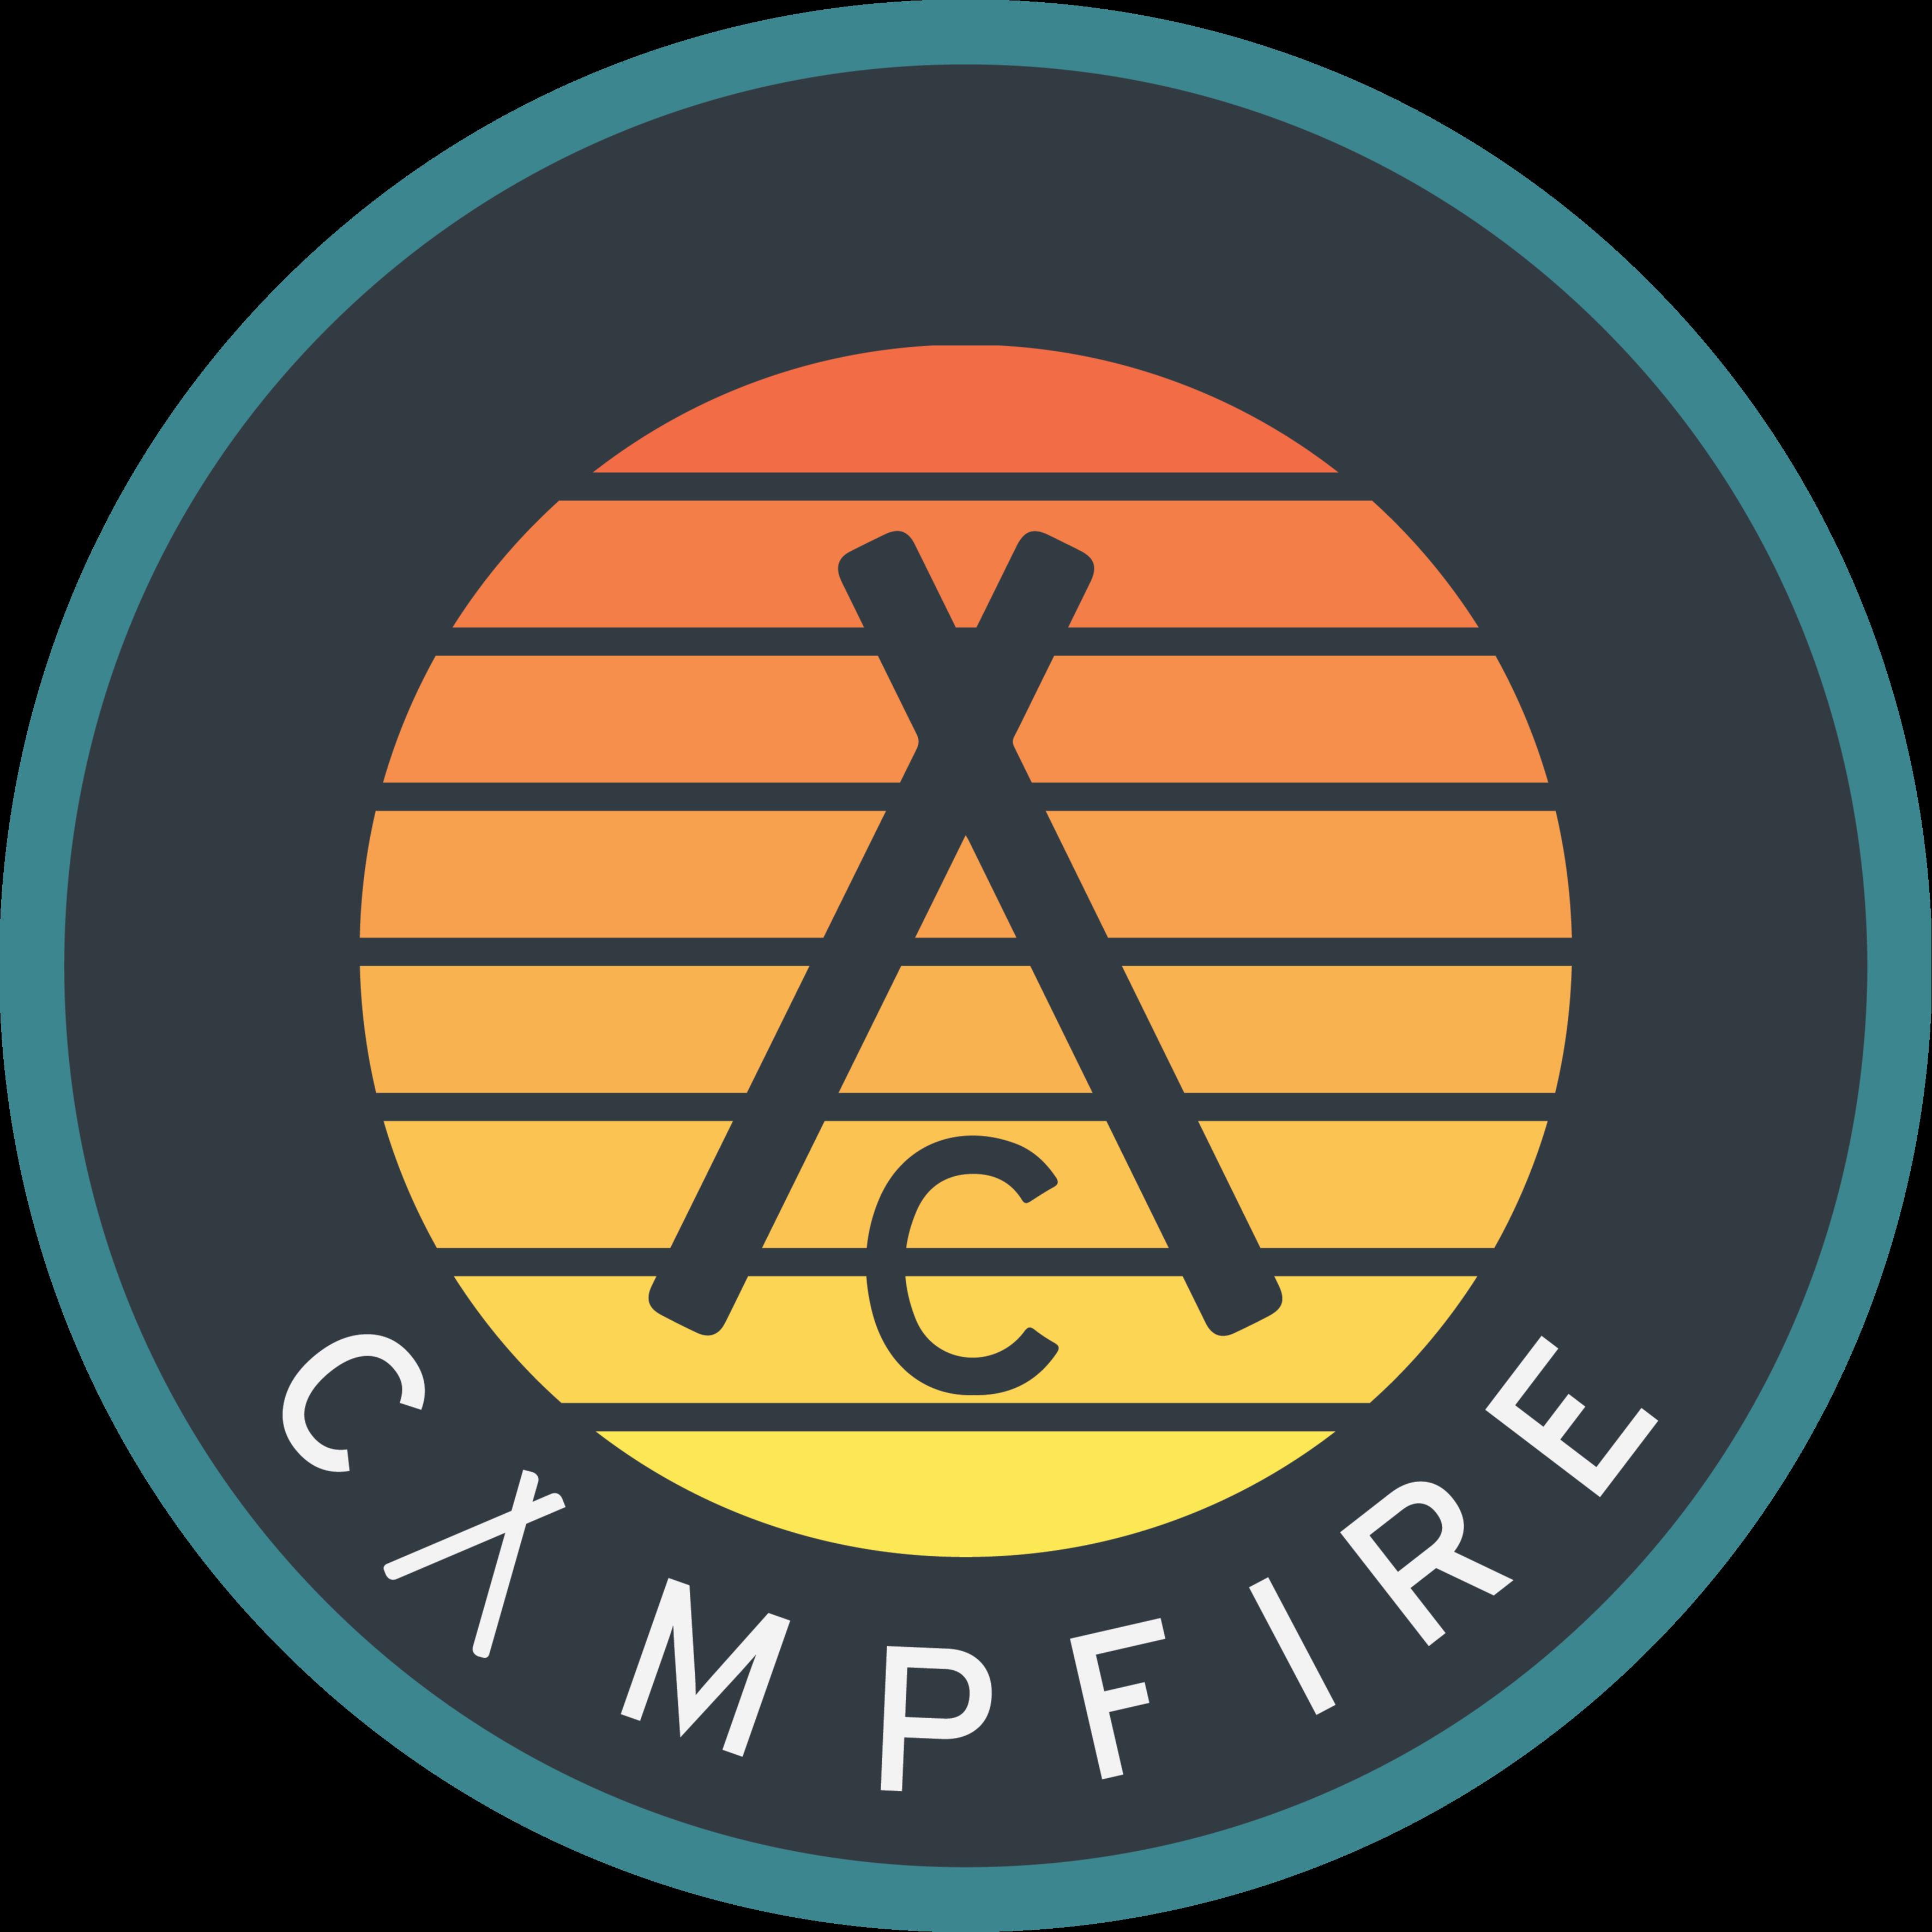 @campfiretrailer Profile Image   Linktree